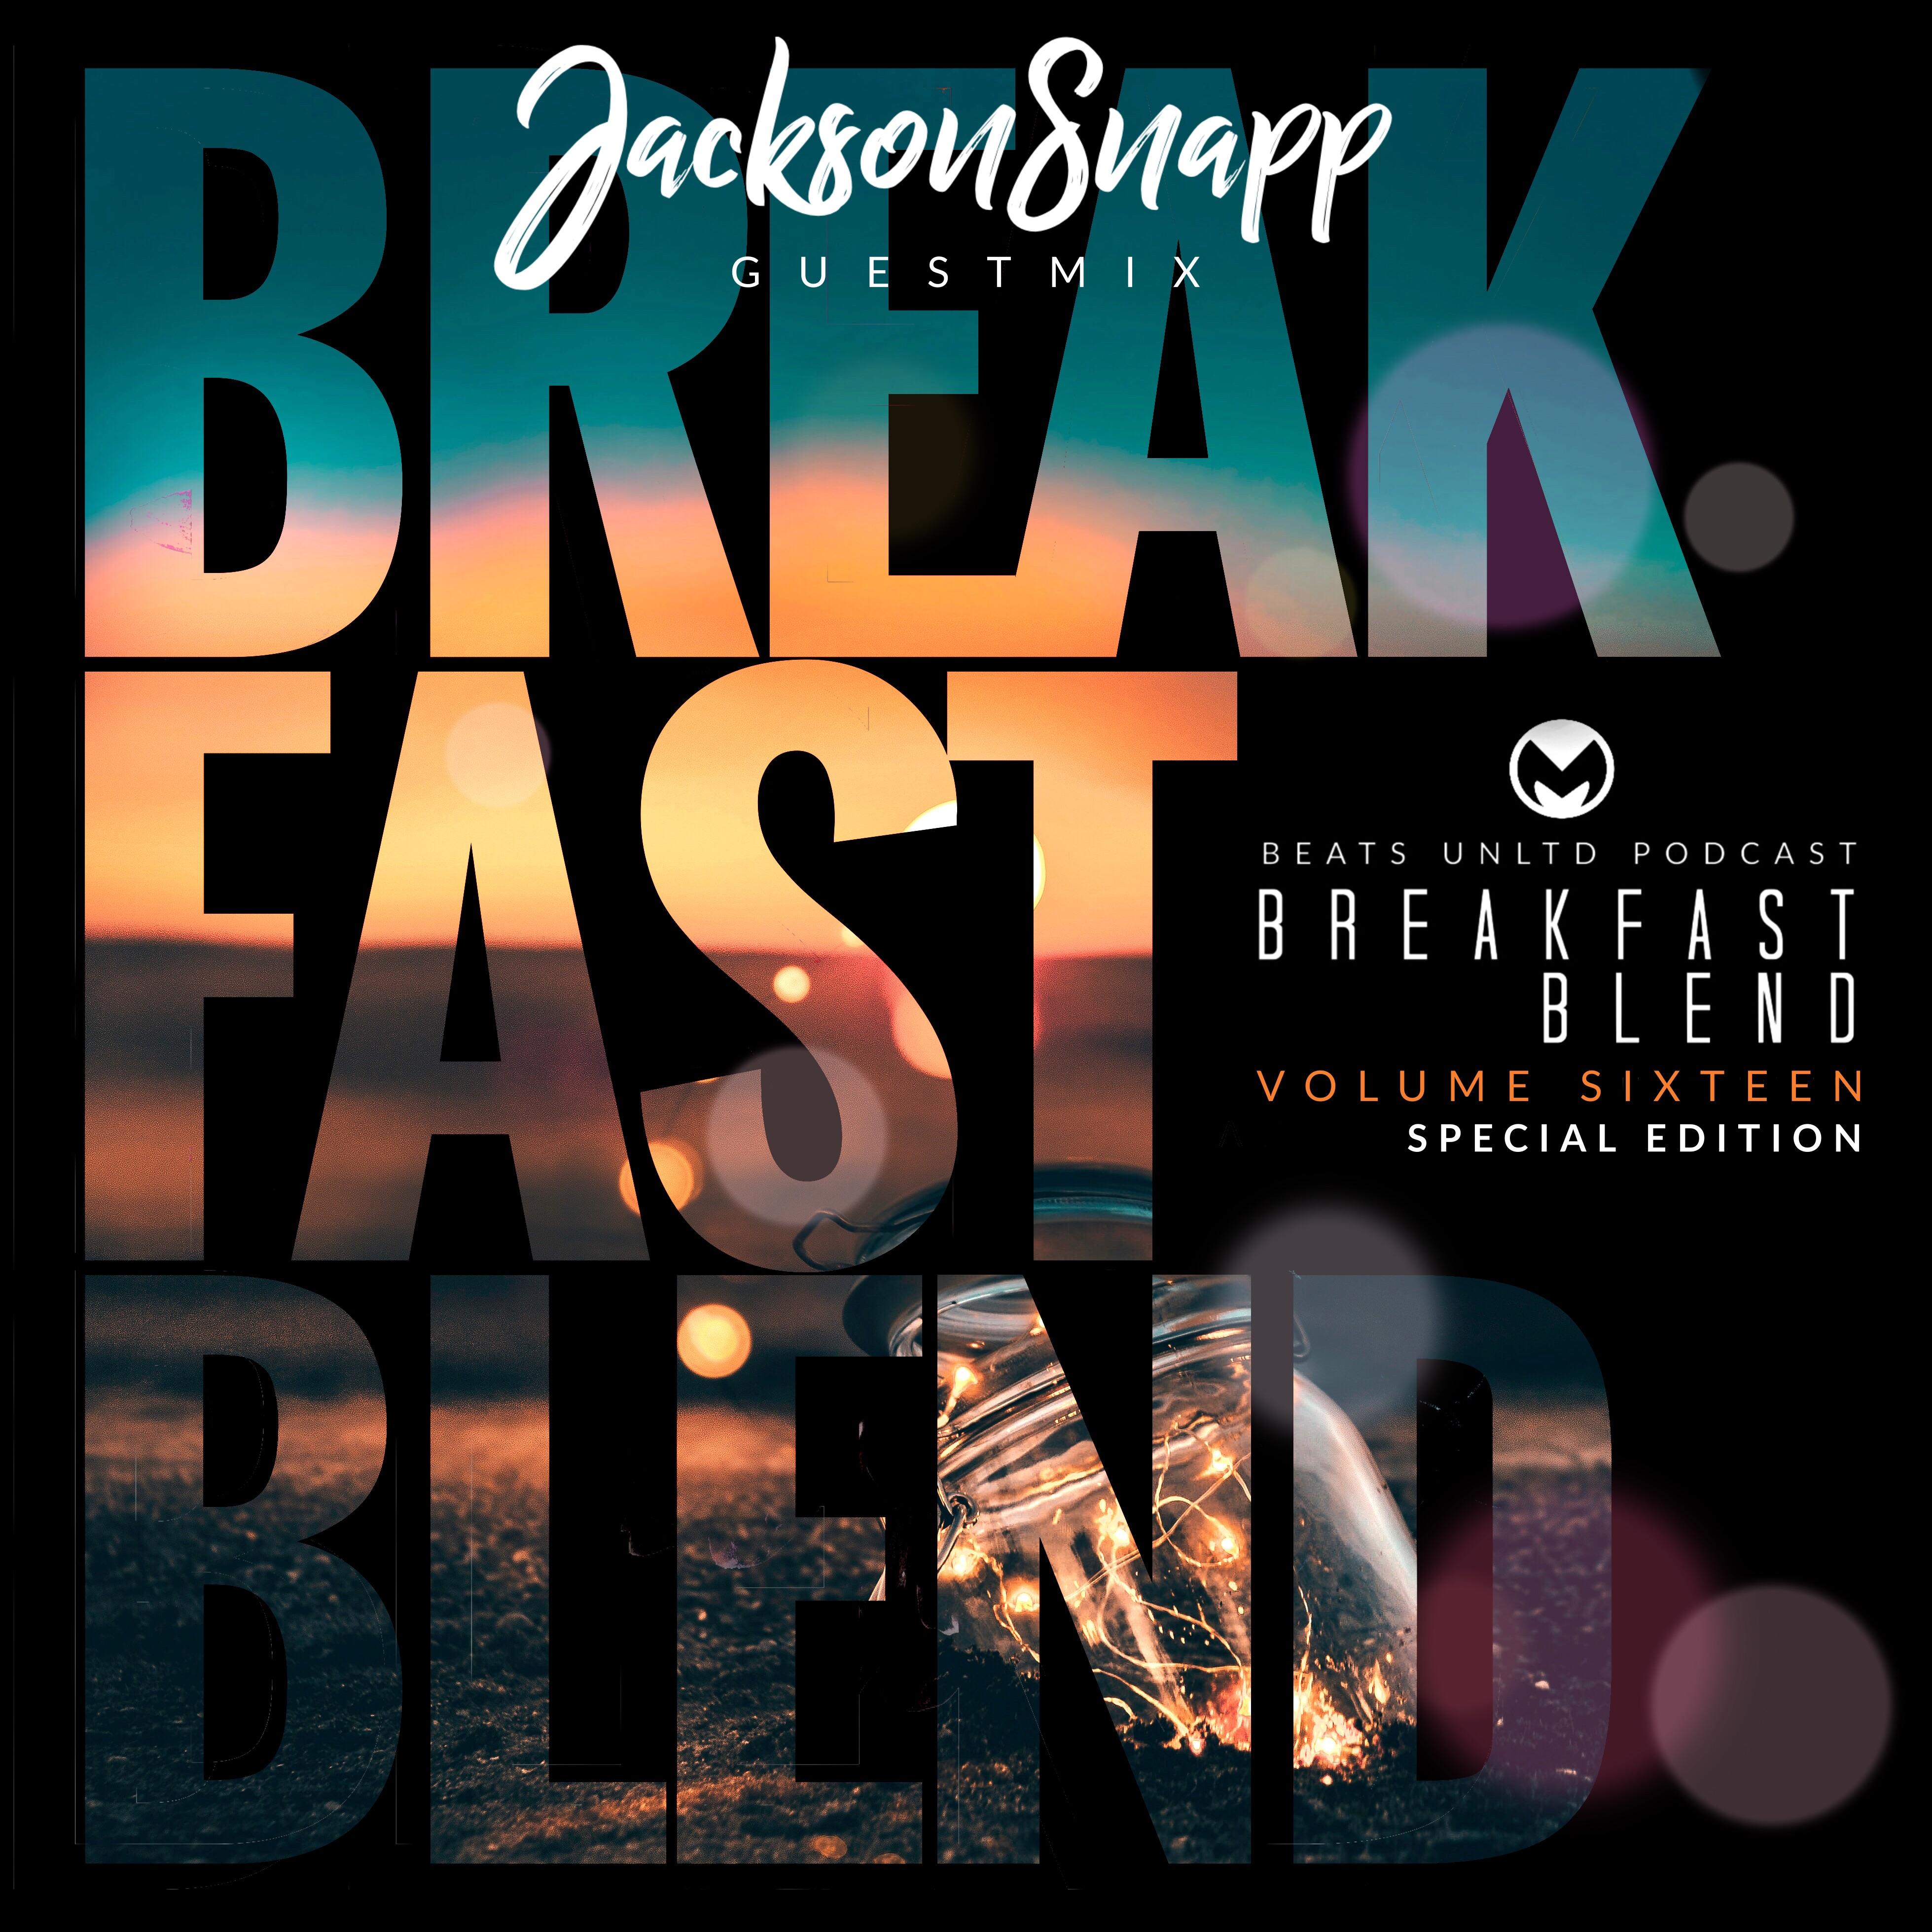 243 Breakfast Blend Volume Sixteen | Jackson Snapp Guest Mix